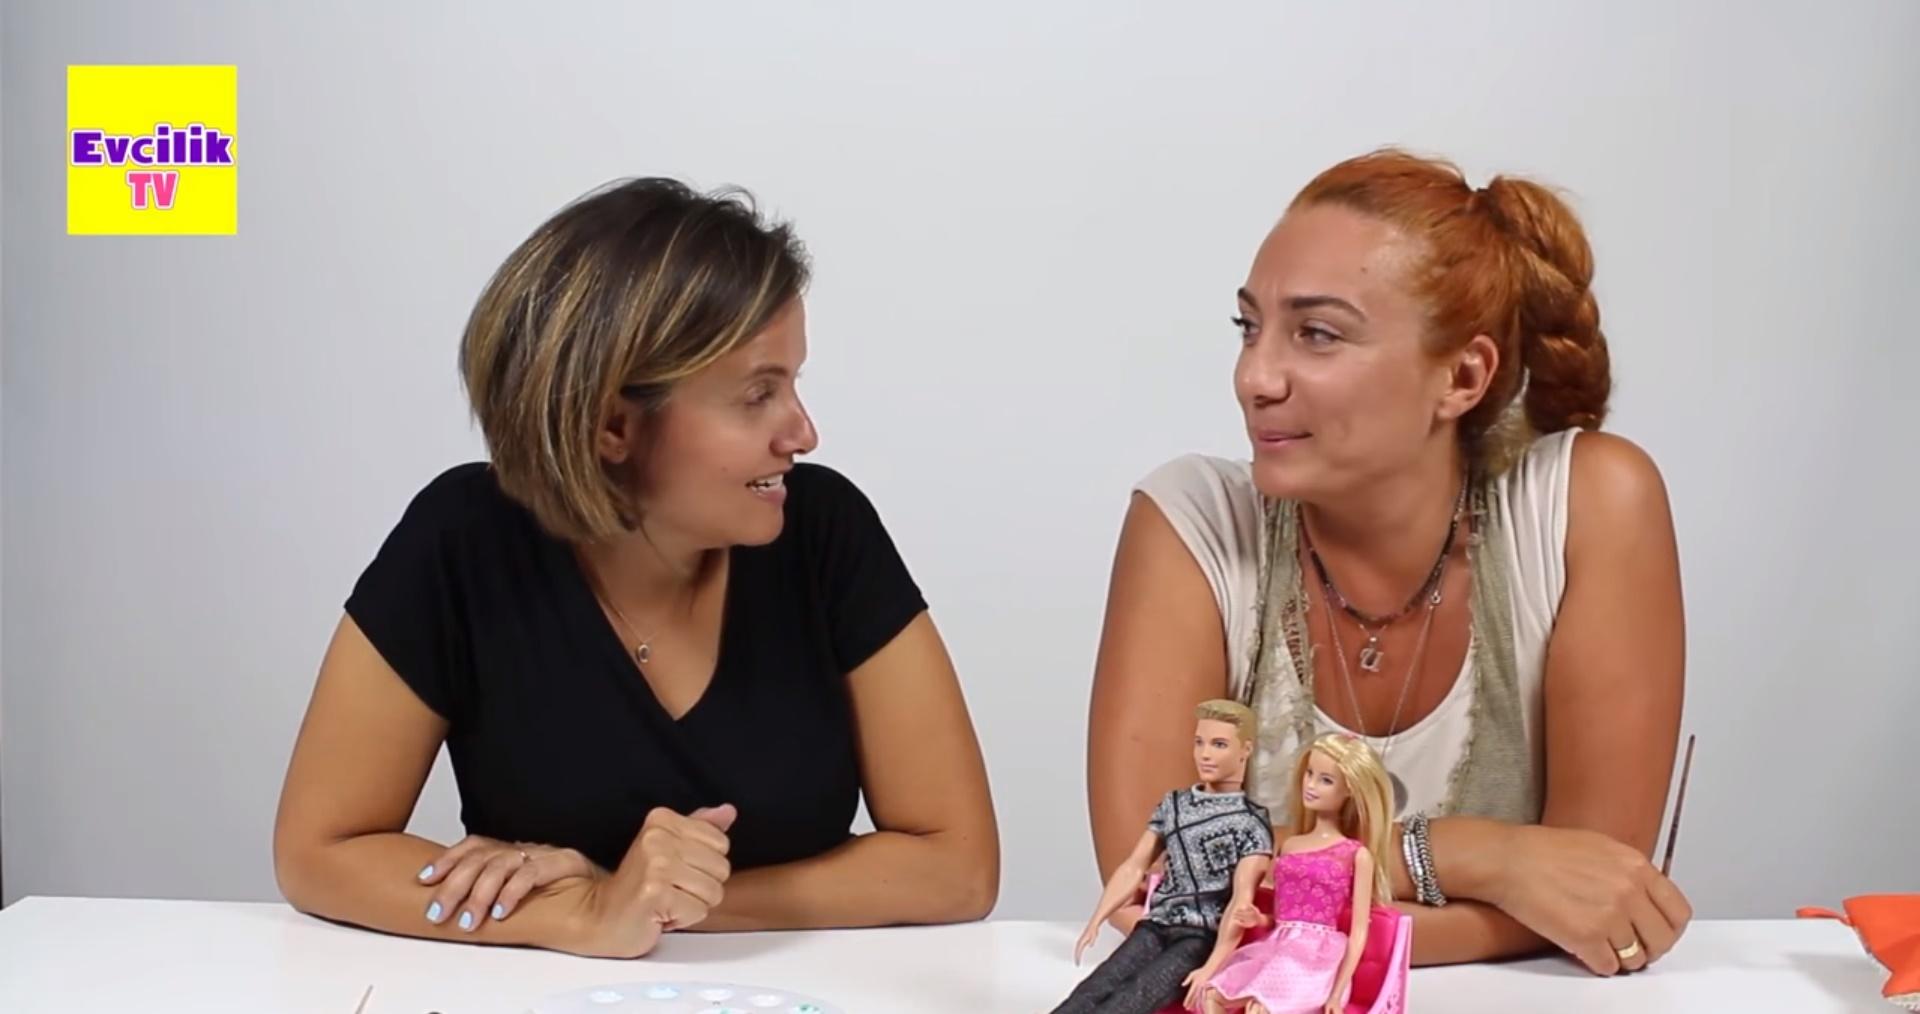 evcilik-tv